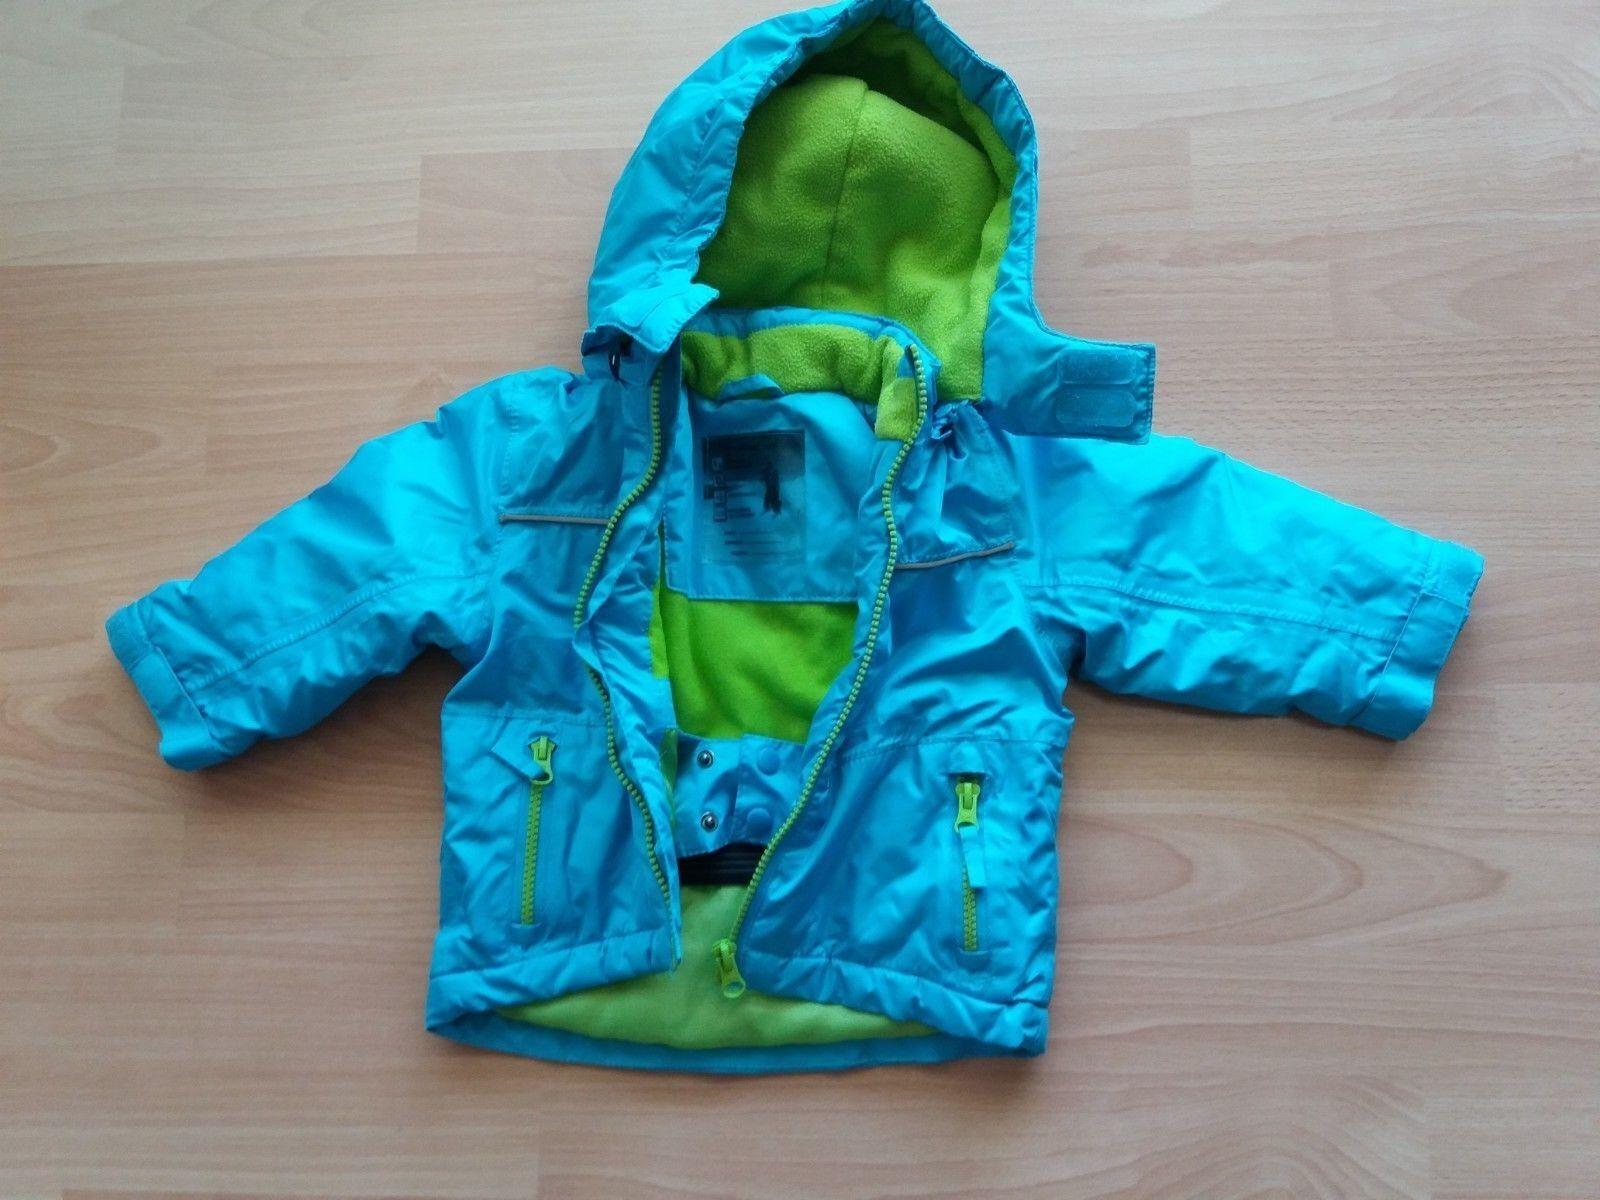 Baby / Kinder Impidimpi Winter / Schnee Jacke Grün/ Türkis Gr. 74 / 80